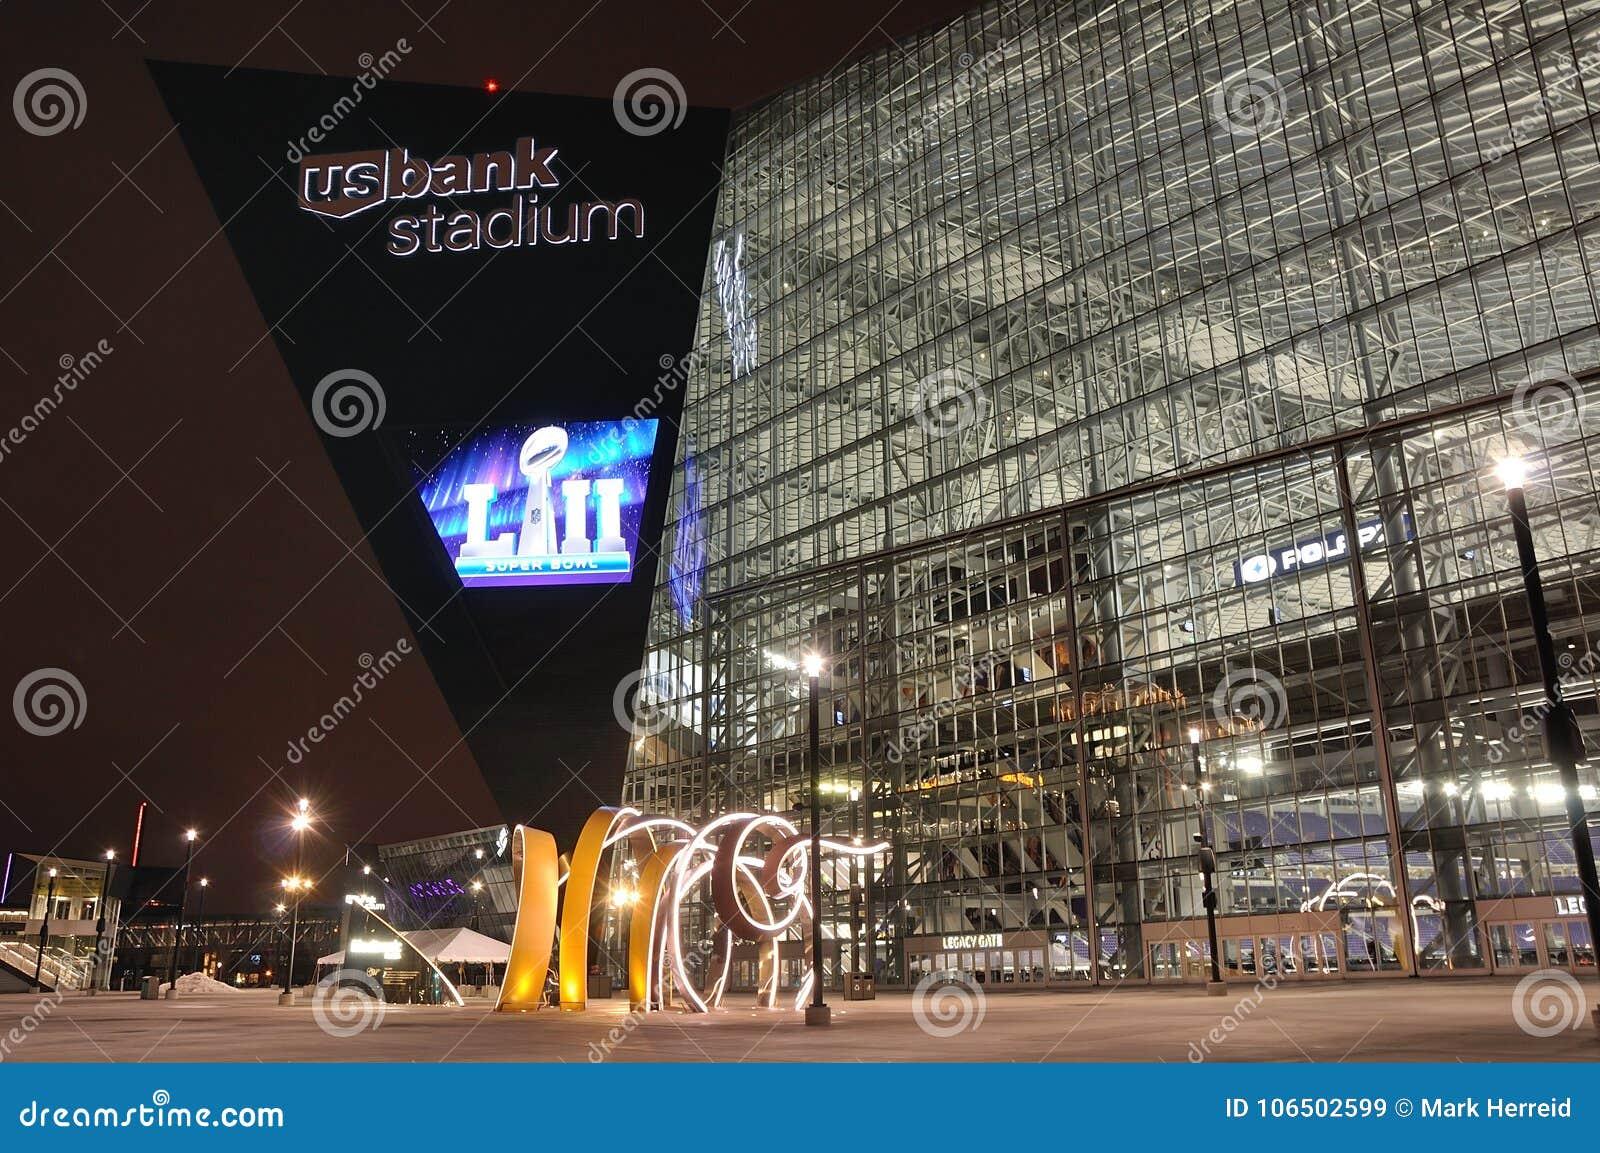 Minnesota Vikings US Bank Stadium in Minneapolis at Night, site of Super Bowl 52